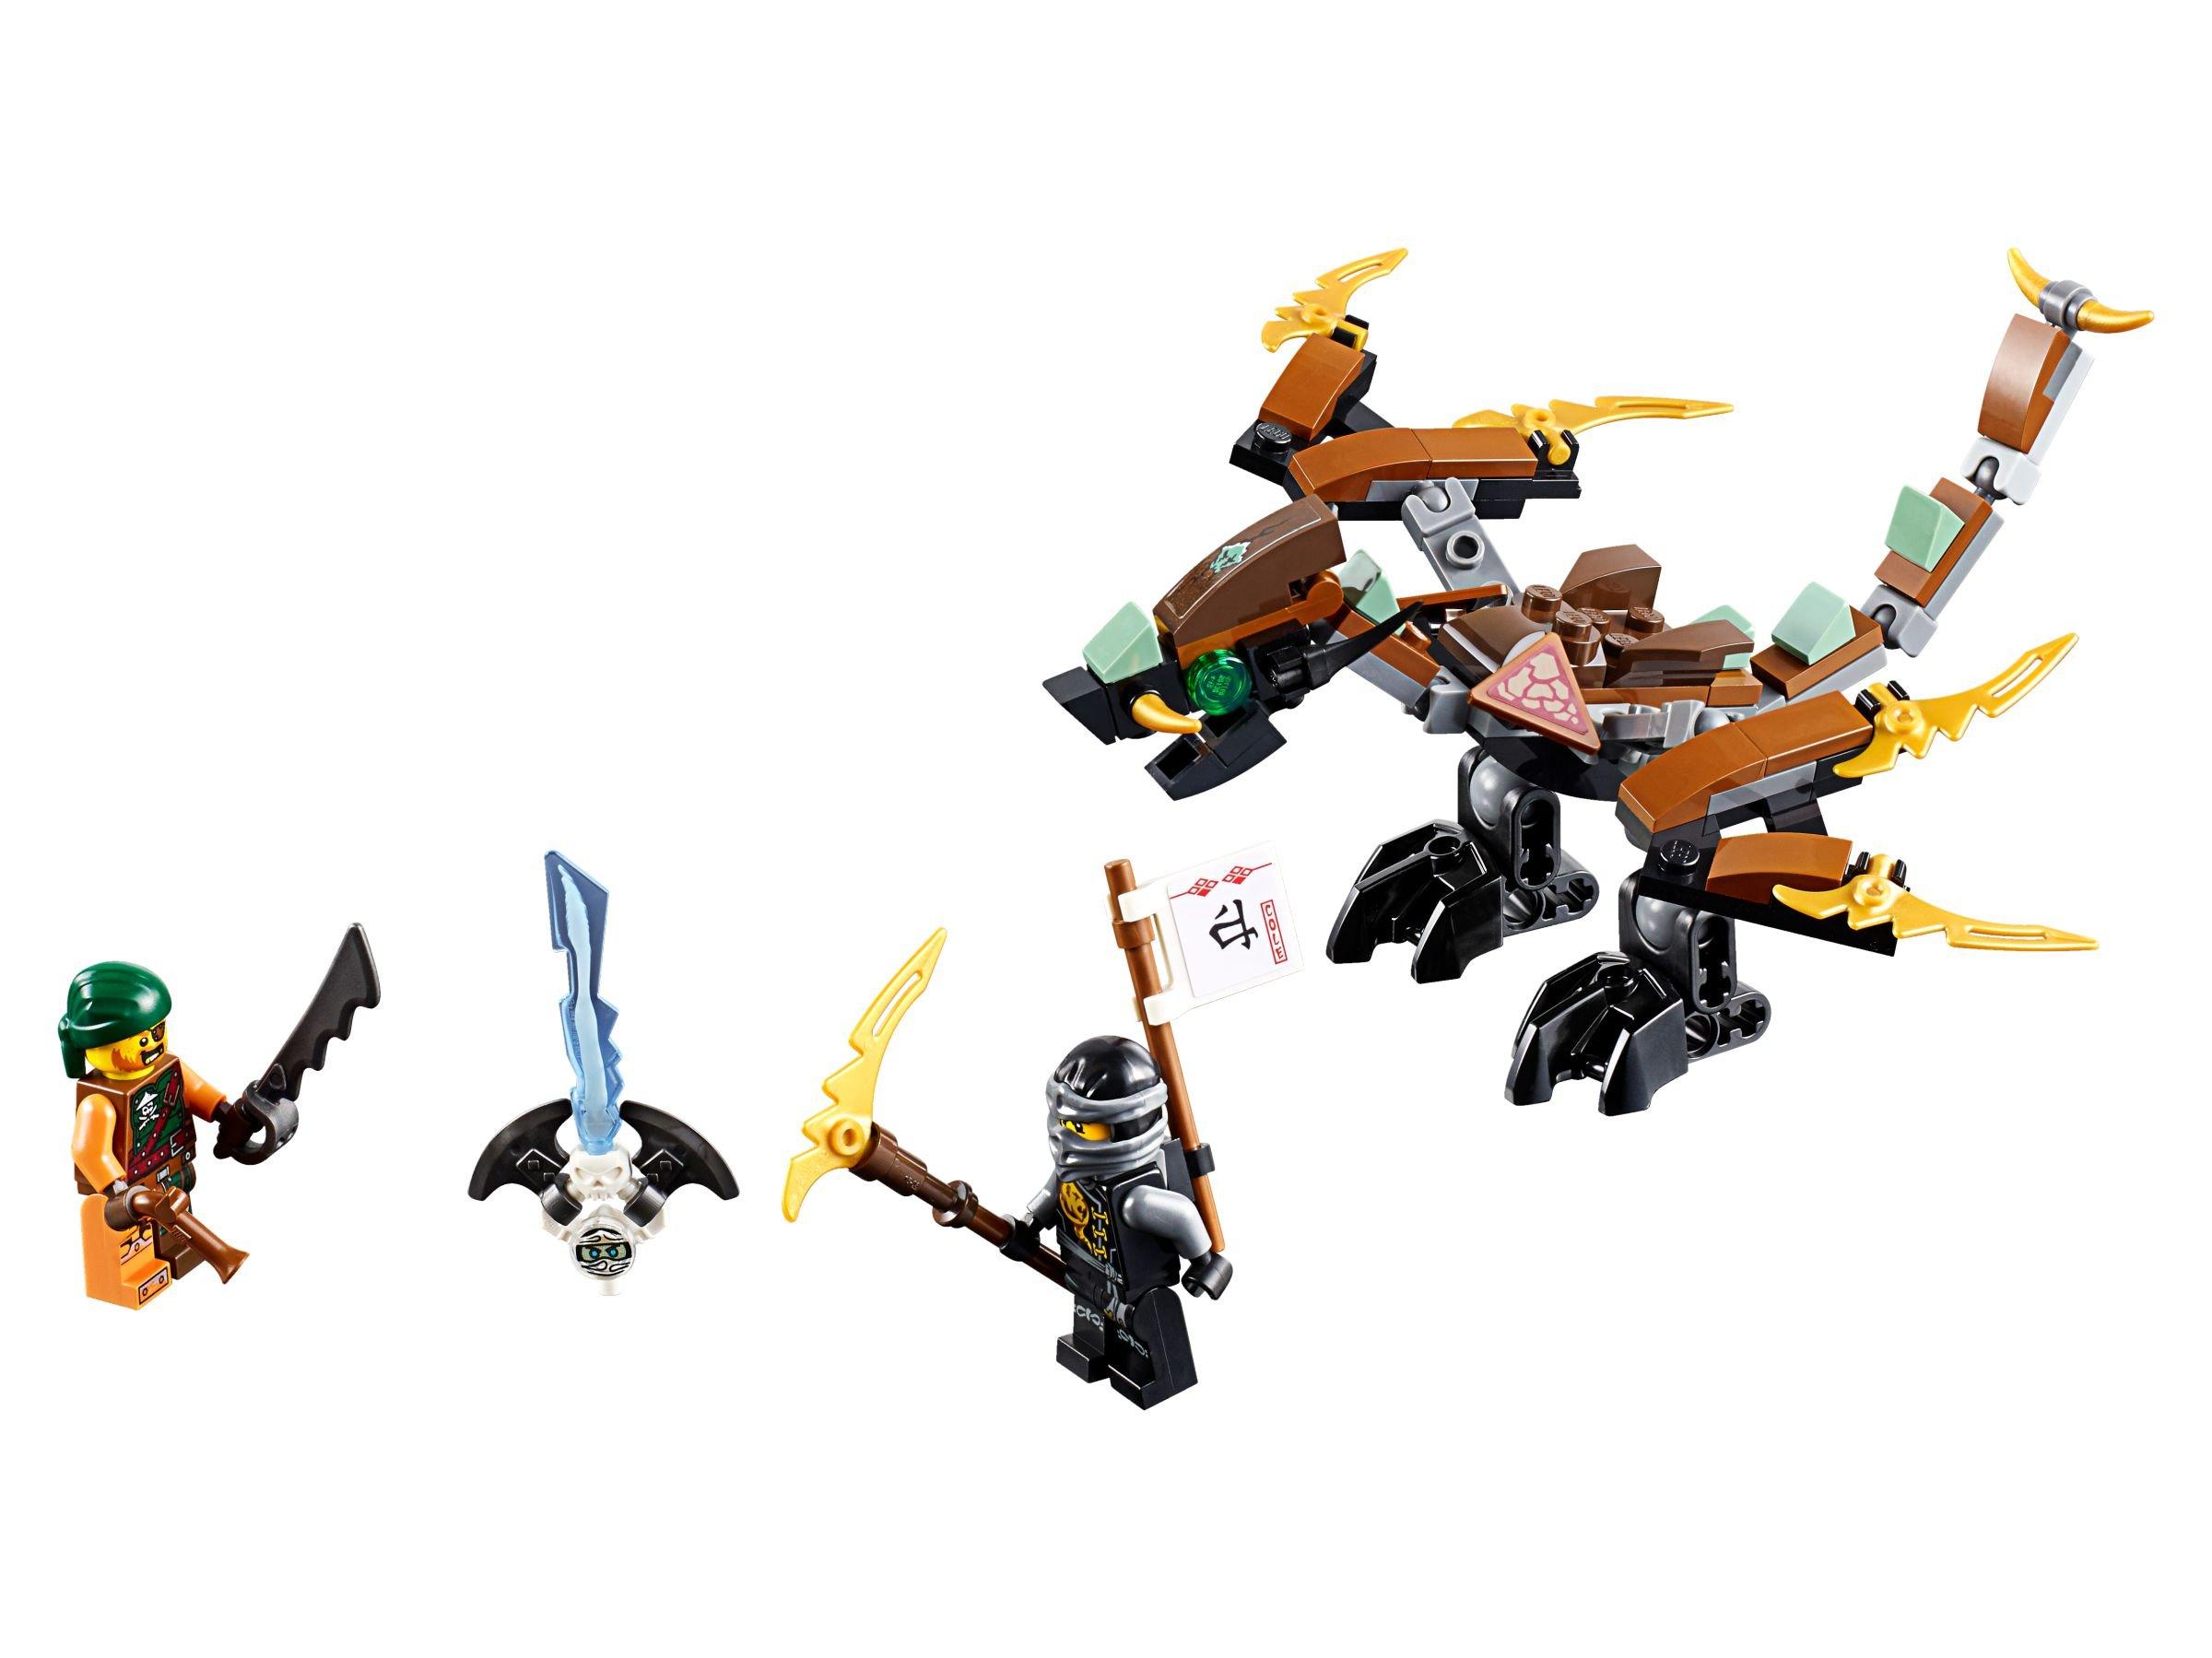 Lego 70599 coles drache ninjago 2016 cole 39 s dragon brickmerge - Dragon ninjago lego ...